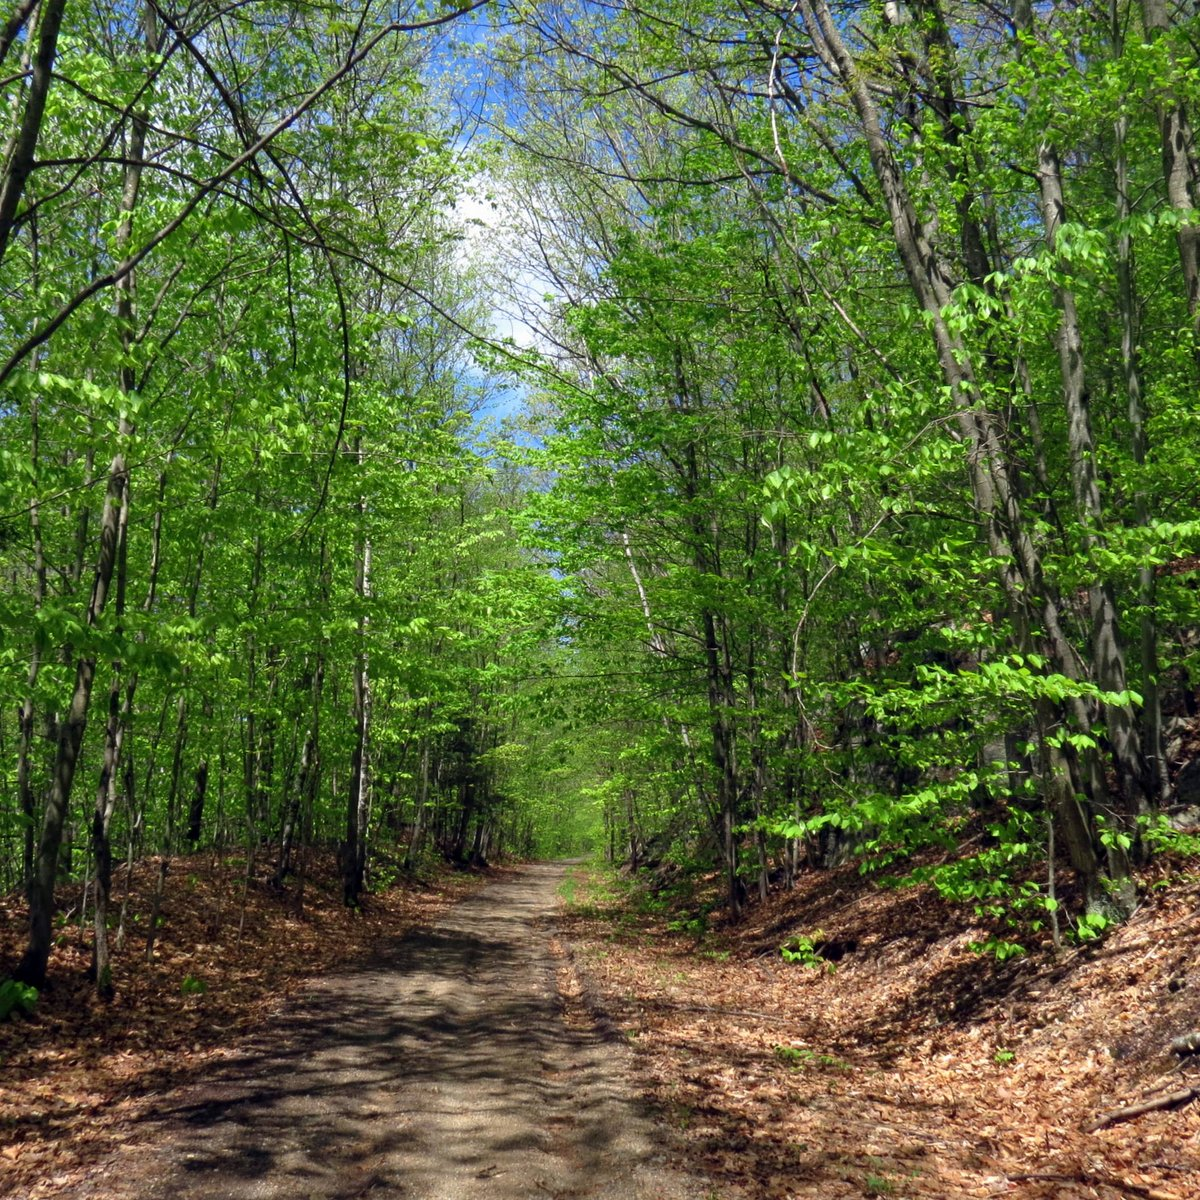 1. Trail